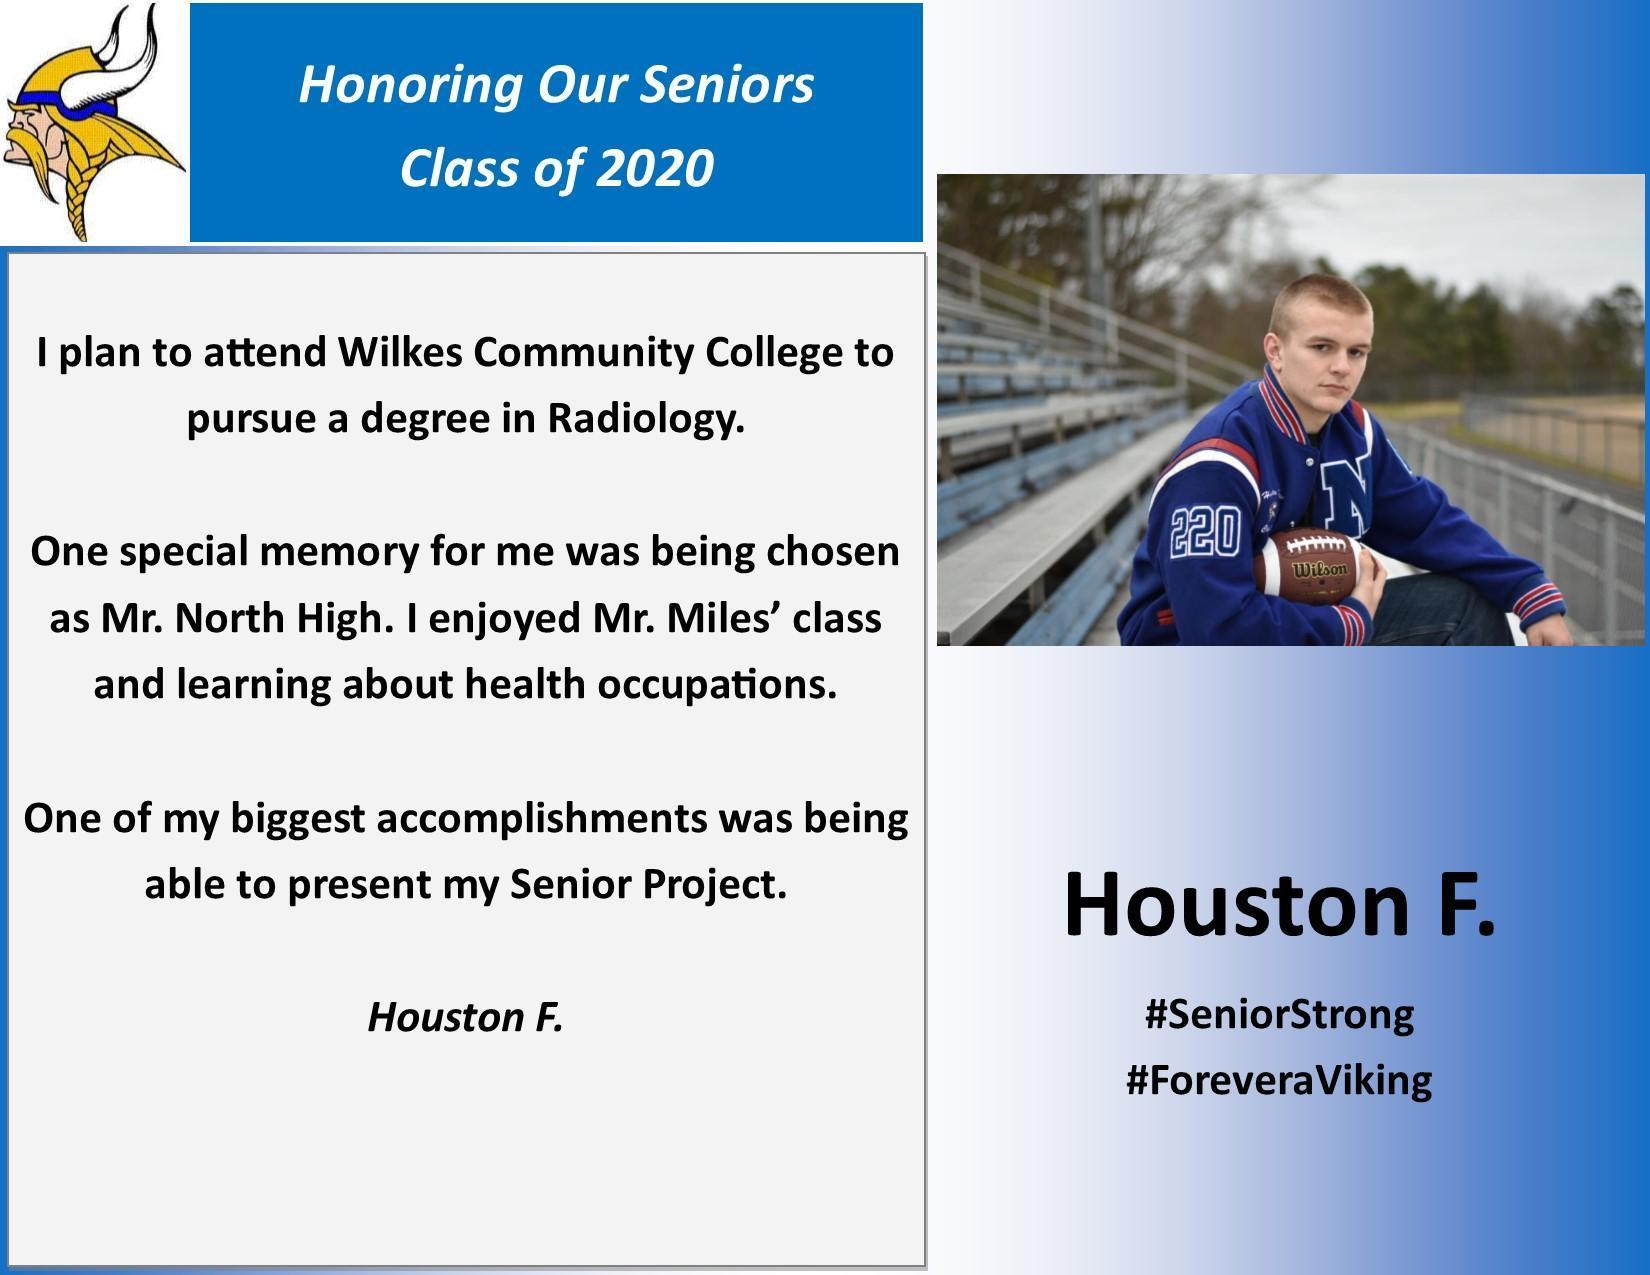 Houston F